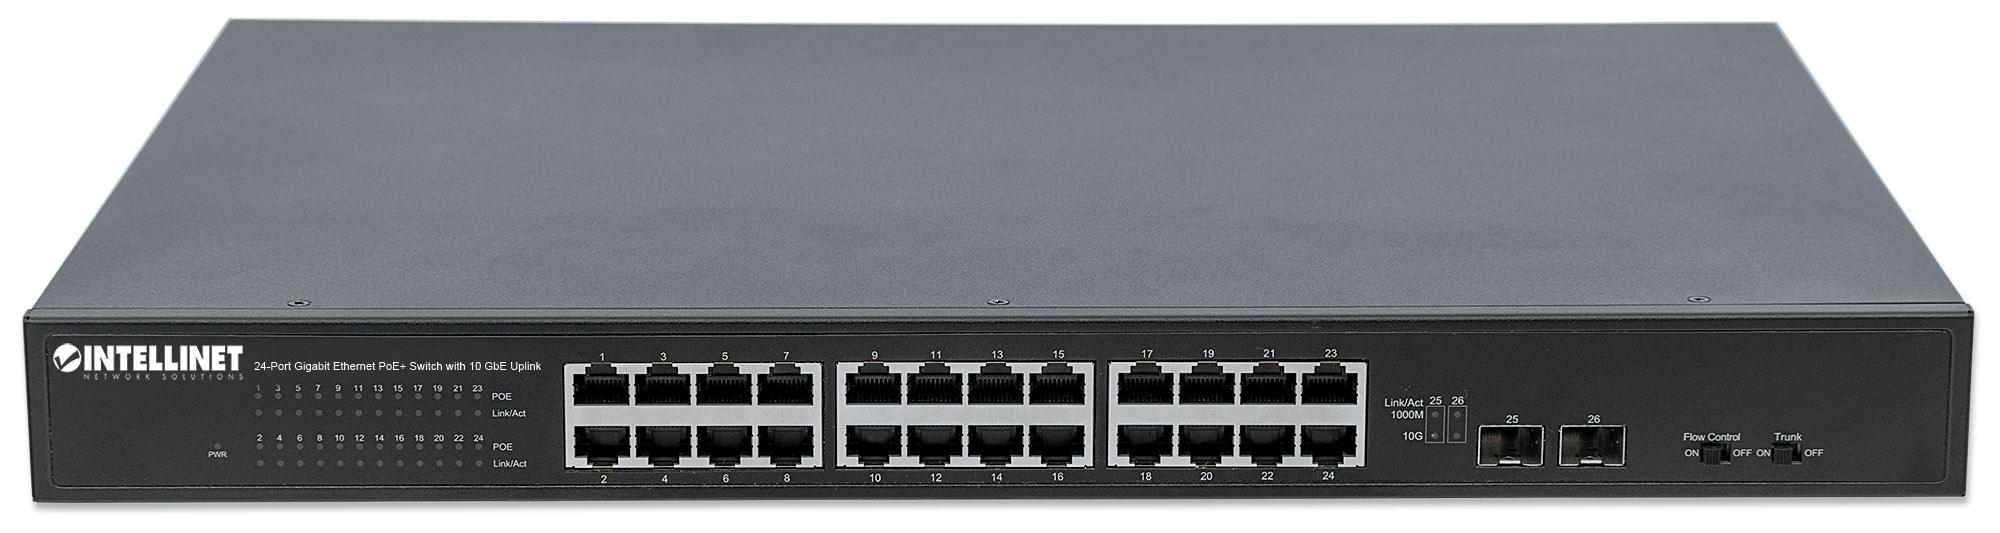 24-Port Gigabit Ethernet PoE+ Switch with 10 GbE Uplink